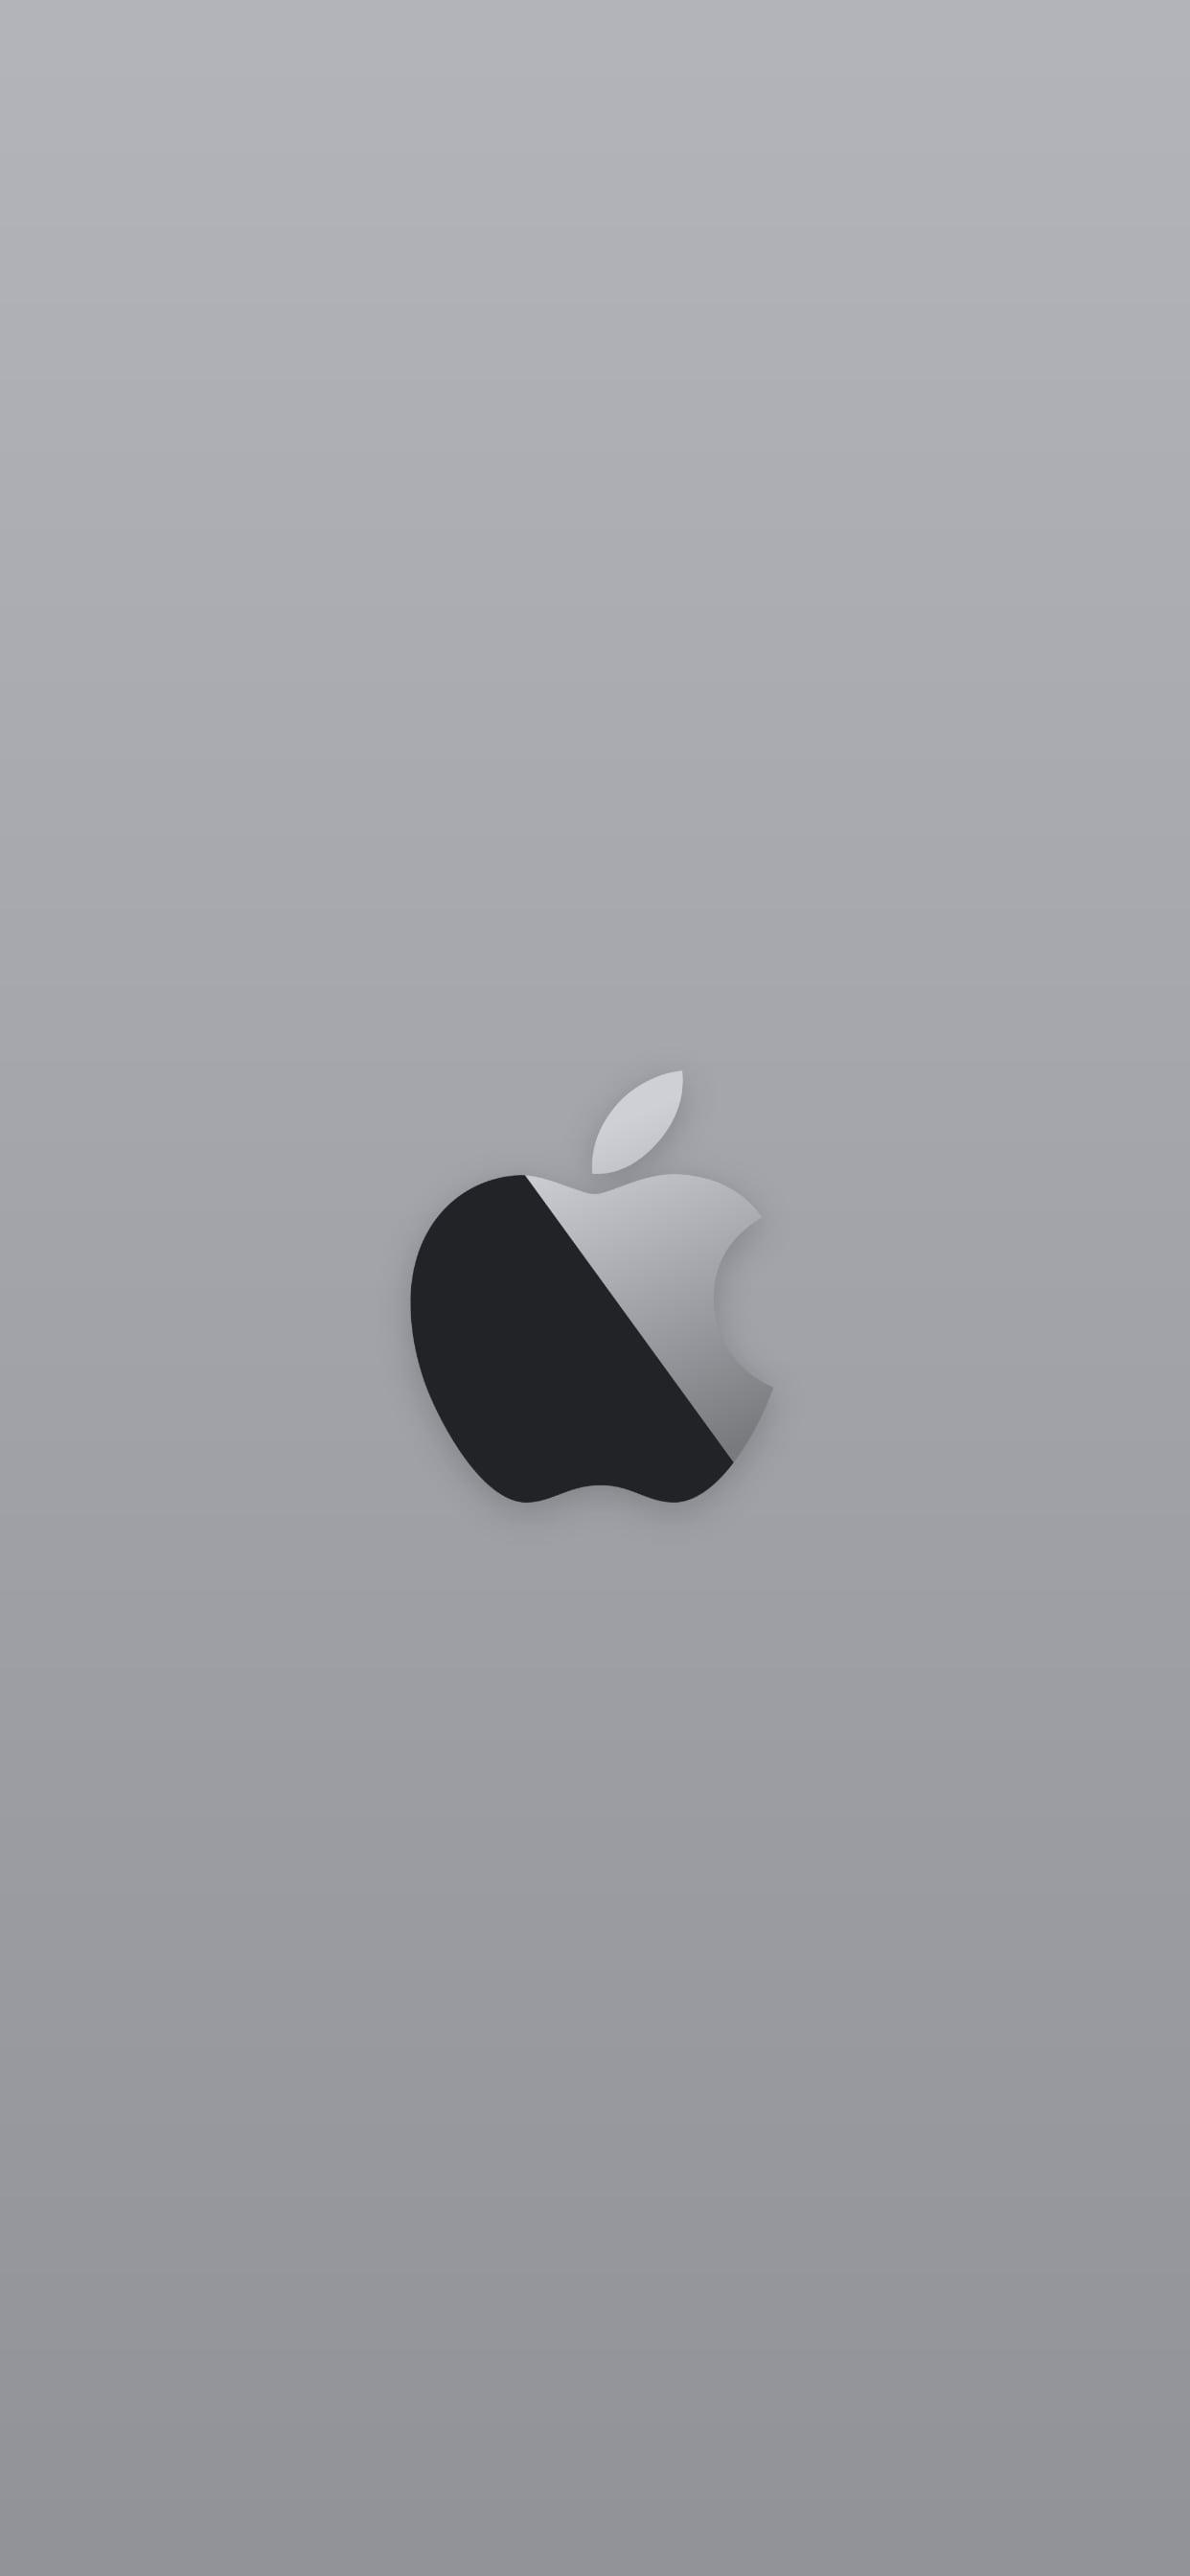 WWDC-1-iPhone@3x